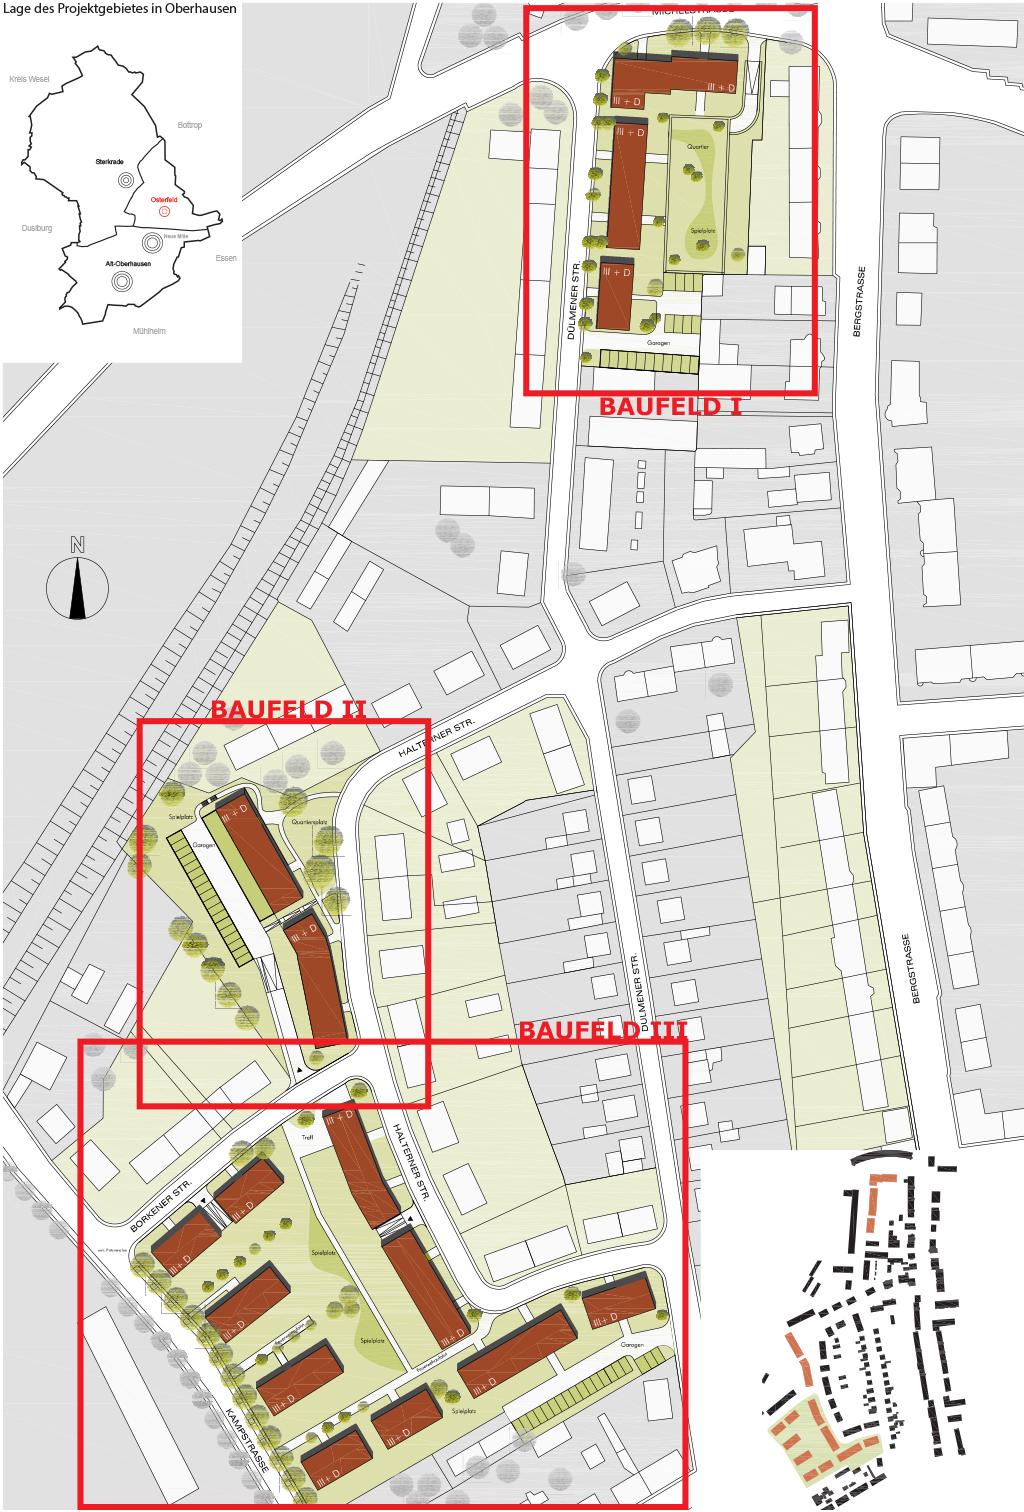 Meier-Ebbers_Stadt_Halterner-Viertel_Baufelder